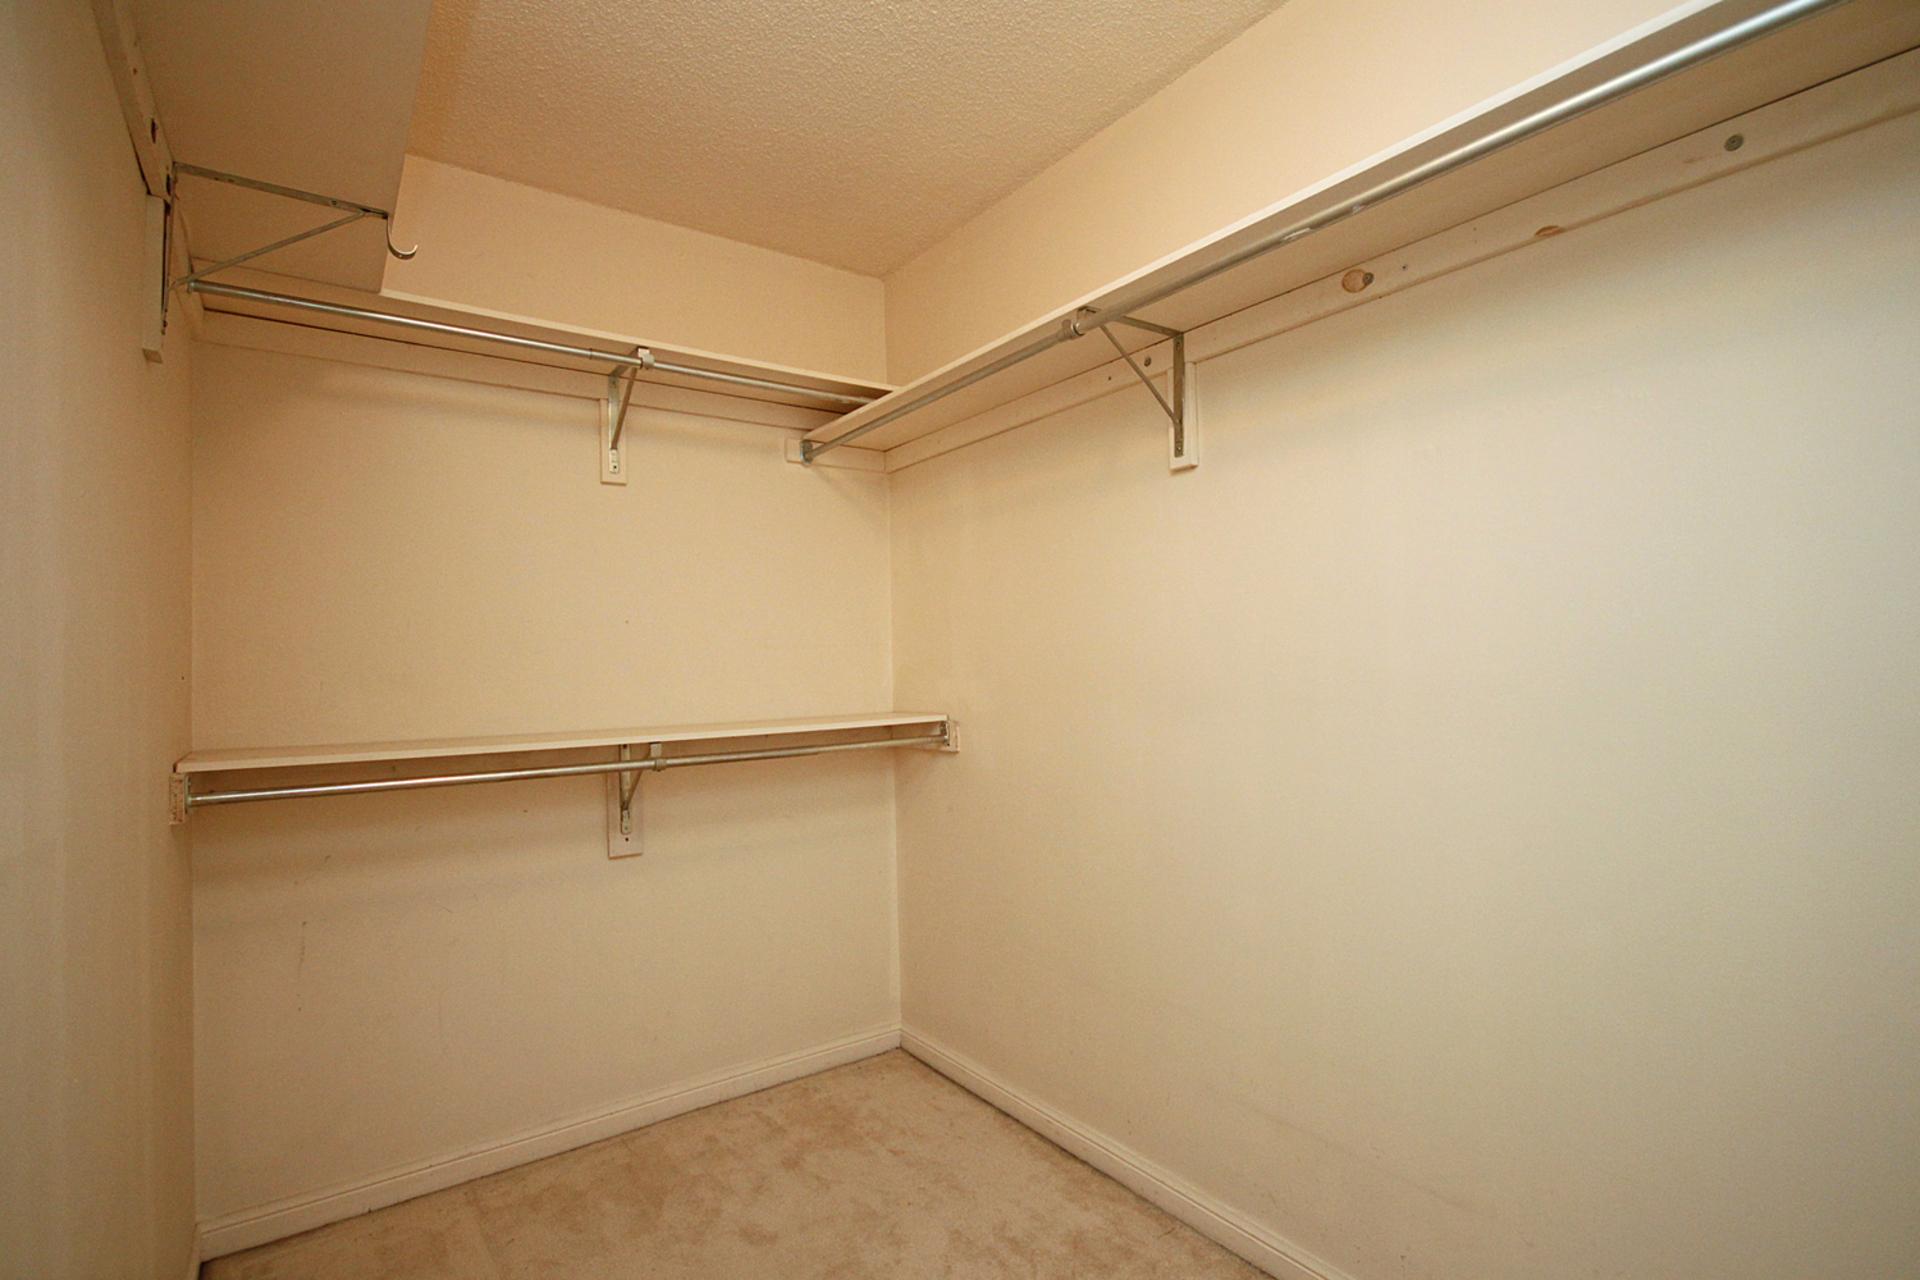 Walk-in Closet at 508 - 245 The Donway Donway W, Banbury-Don Mills, Toronto